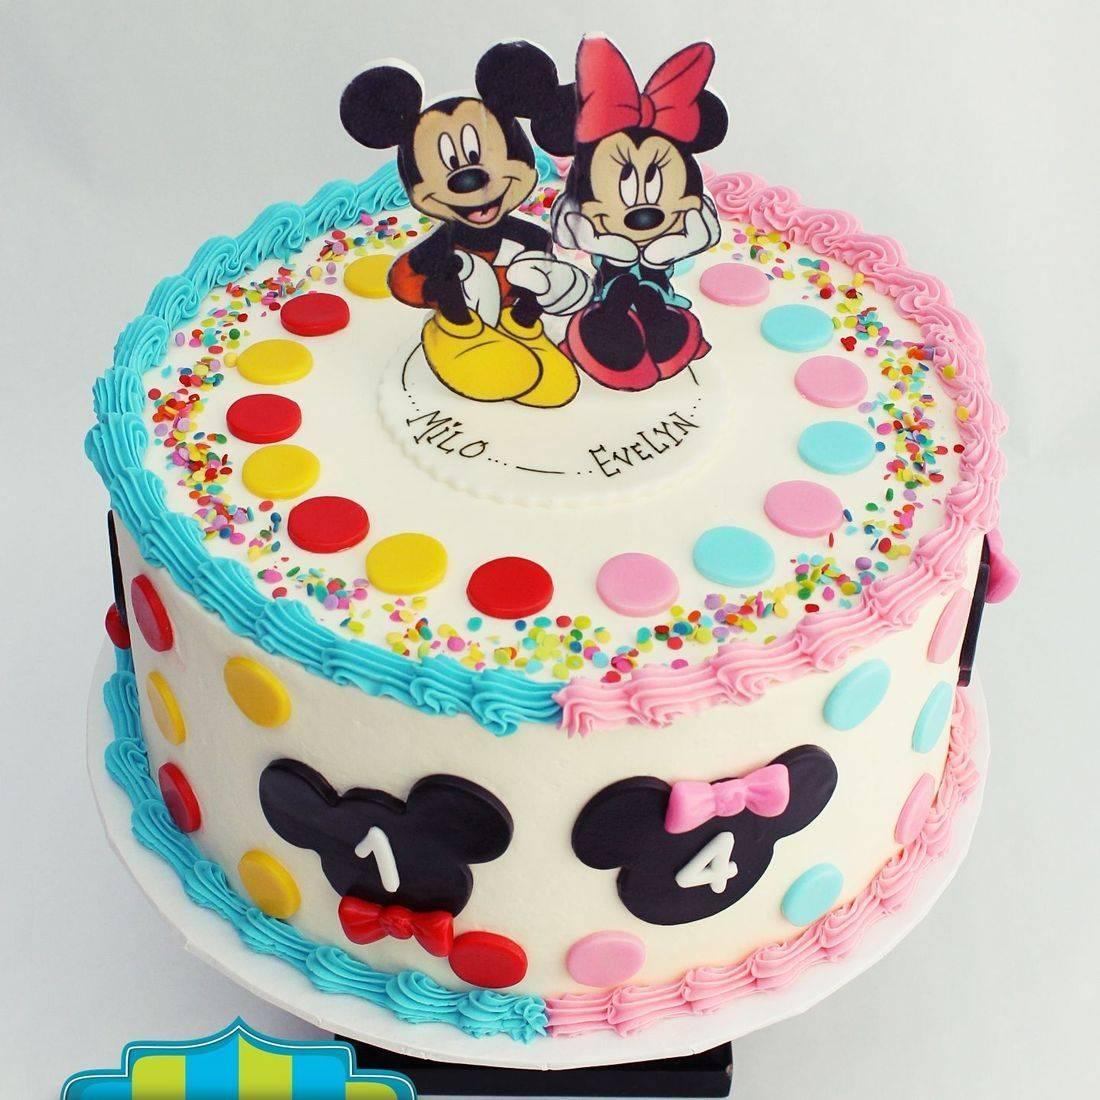 Minnie Mickey stylized cakes milwaukeeRetirement Fishing Cake